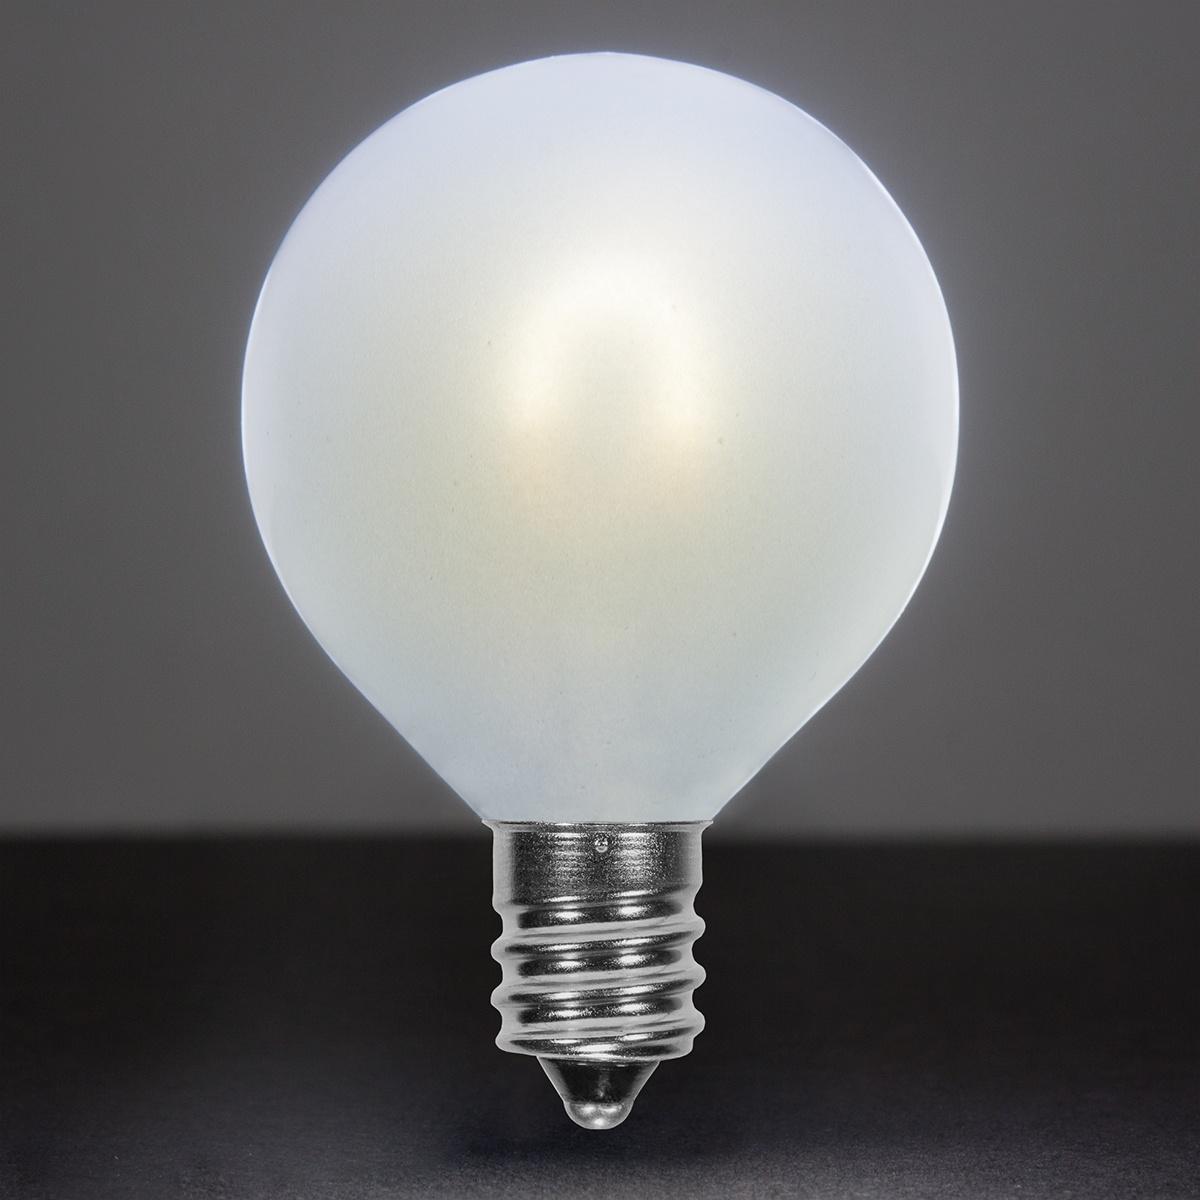 Led White Flexfilament G50 Glass Cool Tm BulbSatin Edison OZiwXTkPu